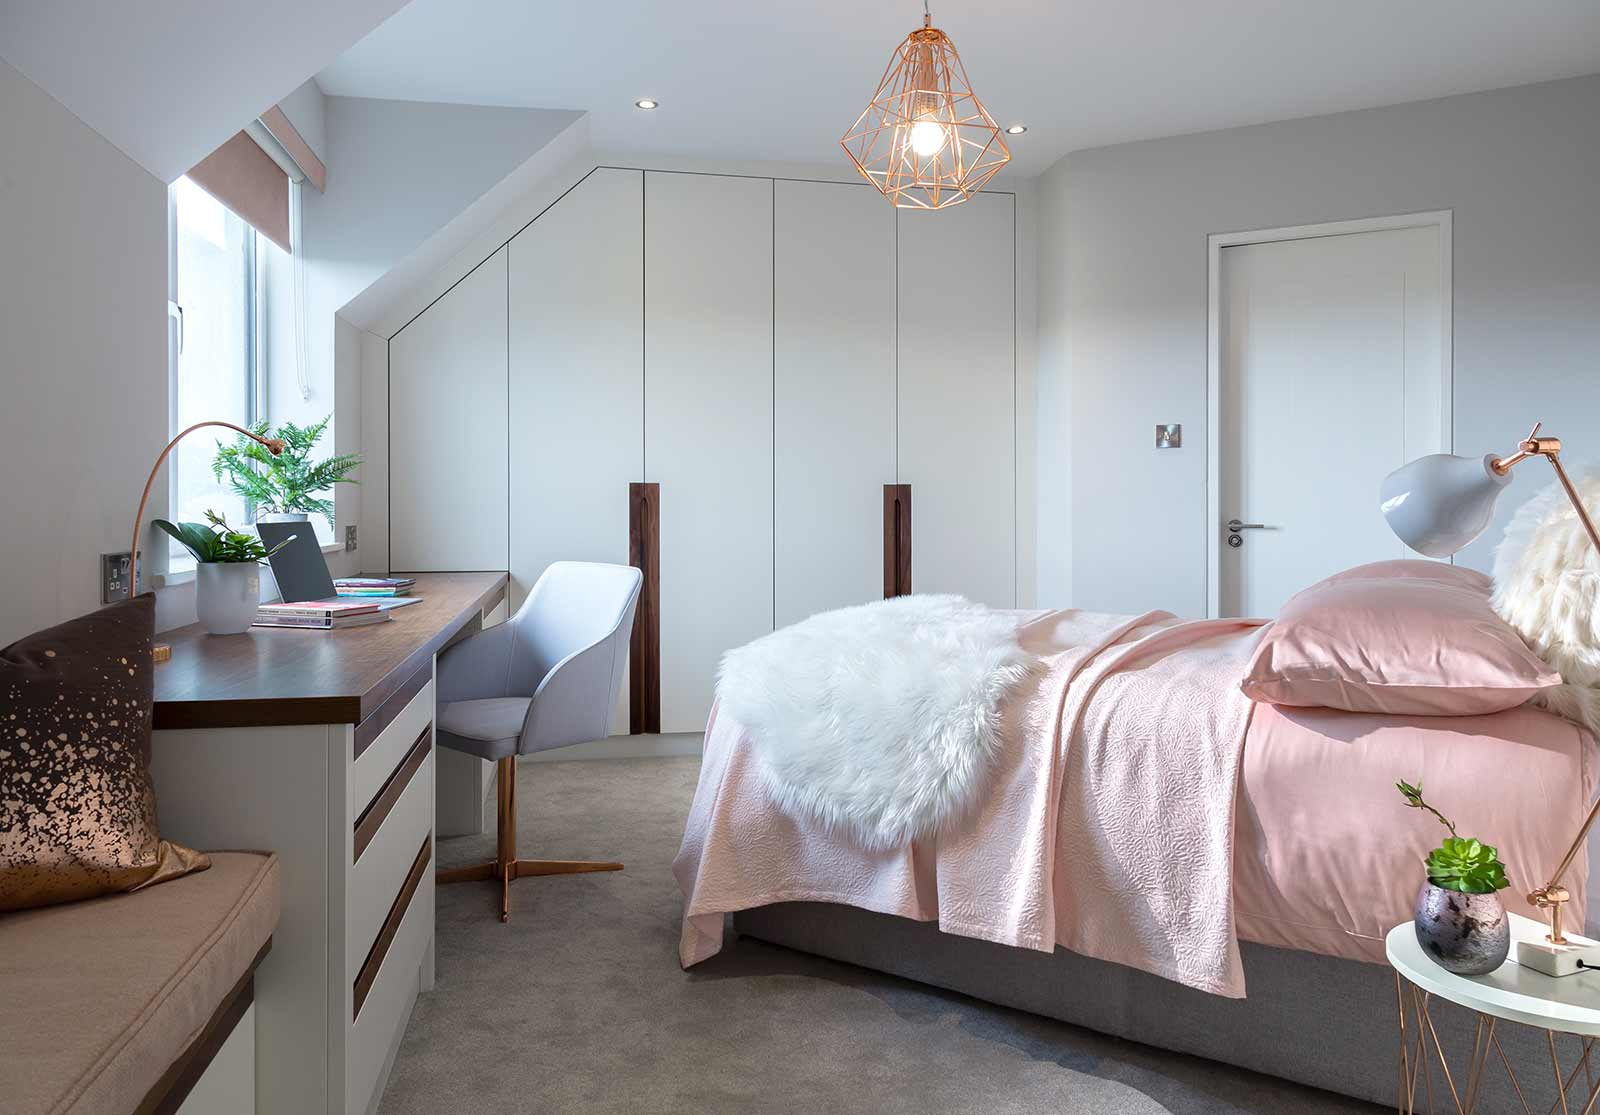 Carton-Interiors_P7_1_Bedroom